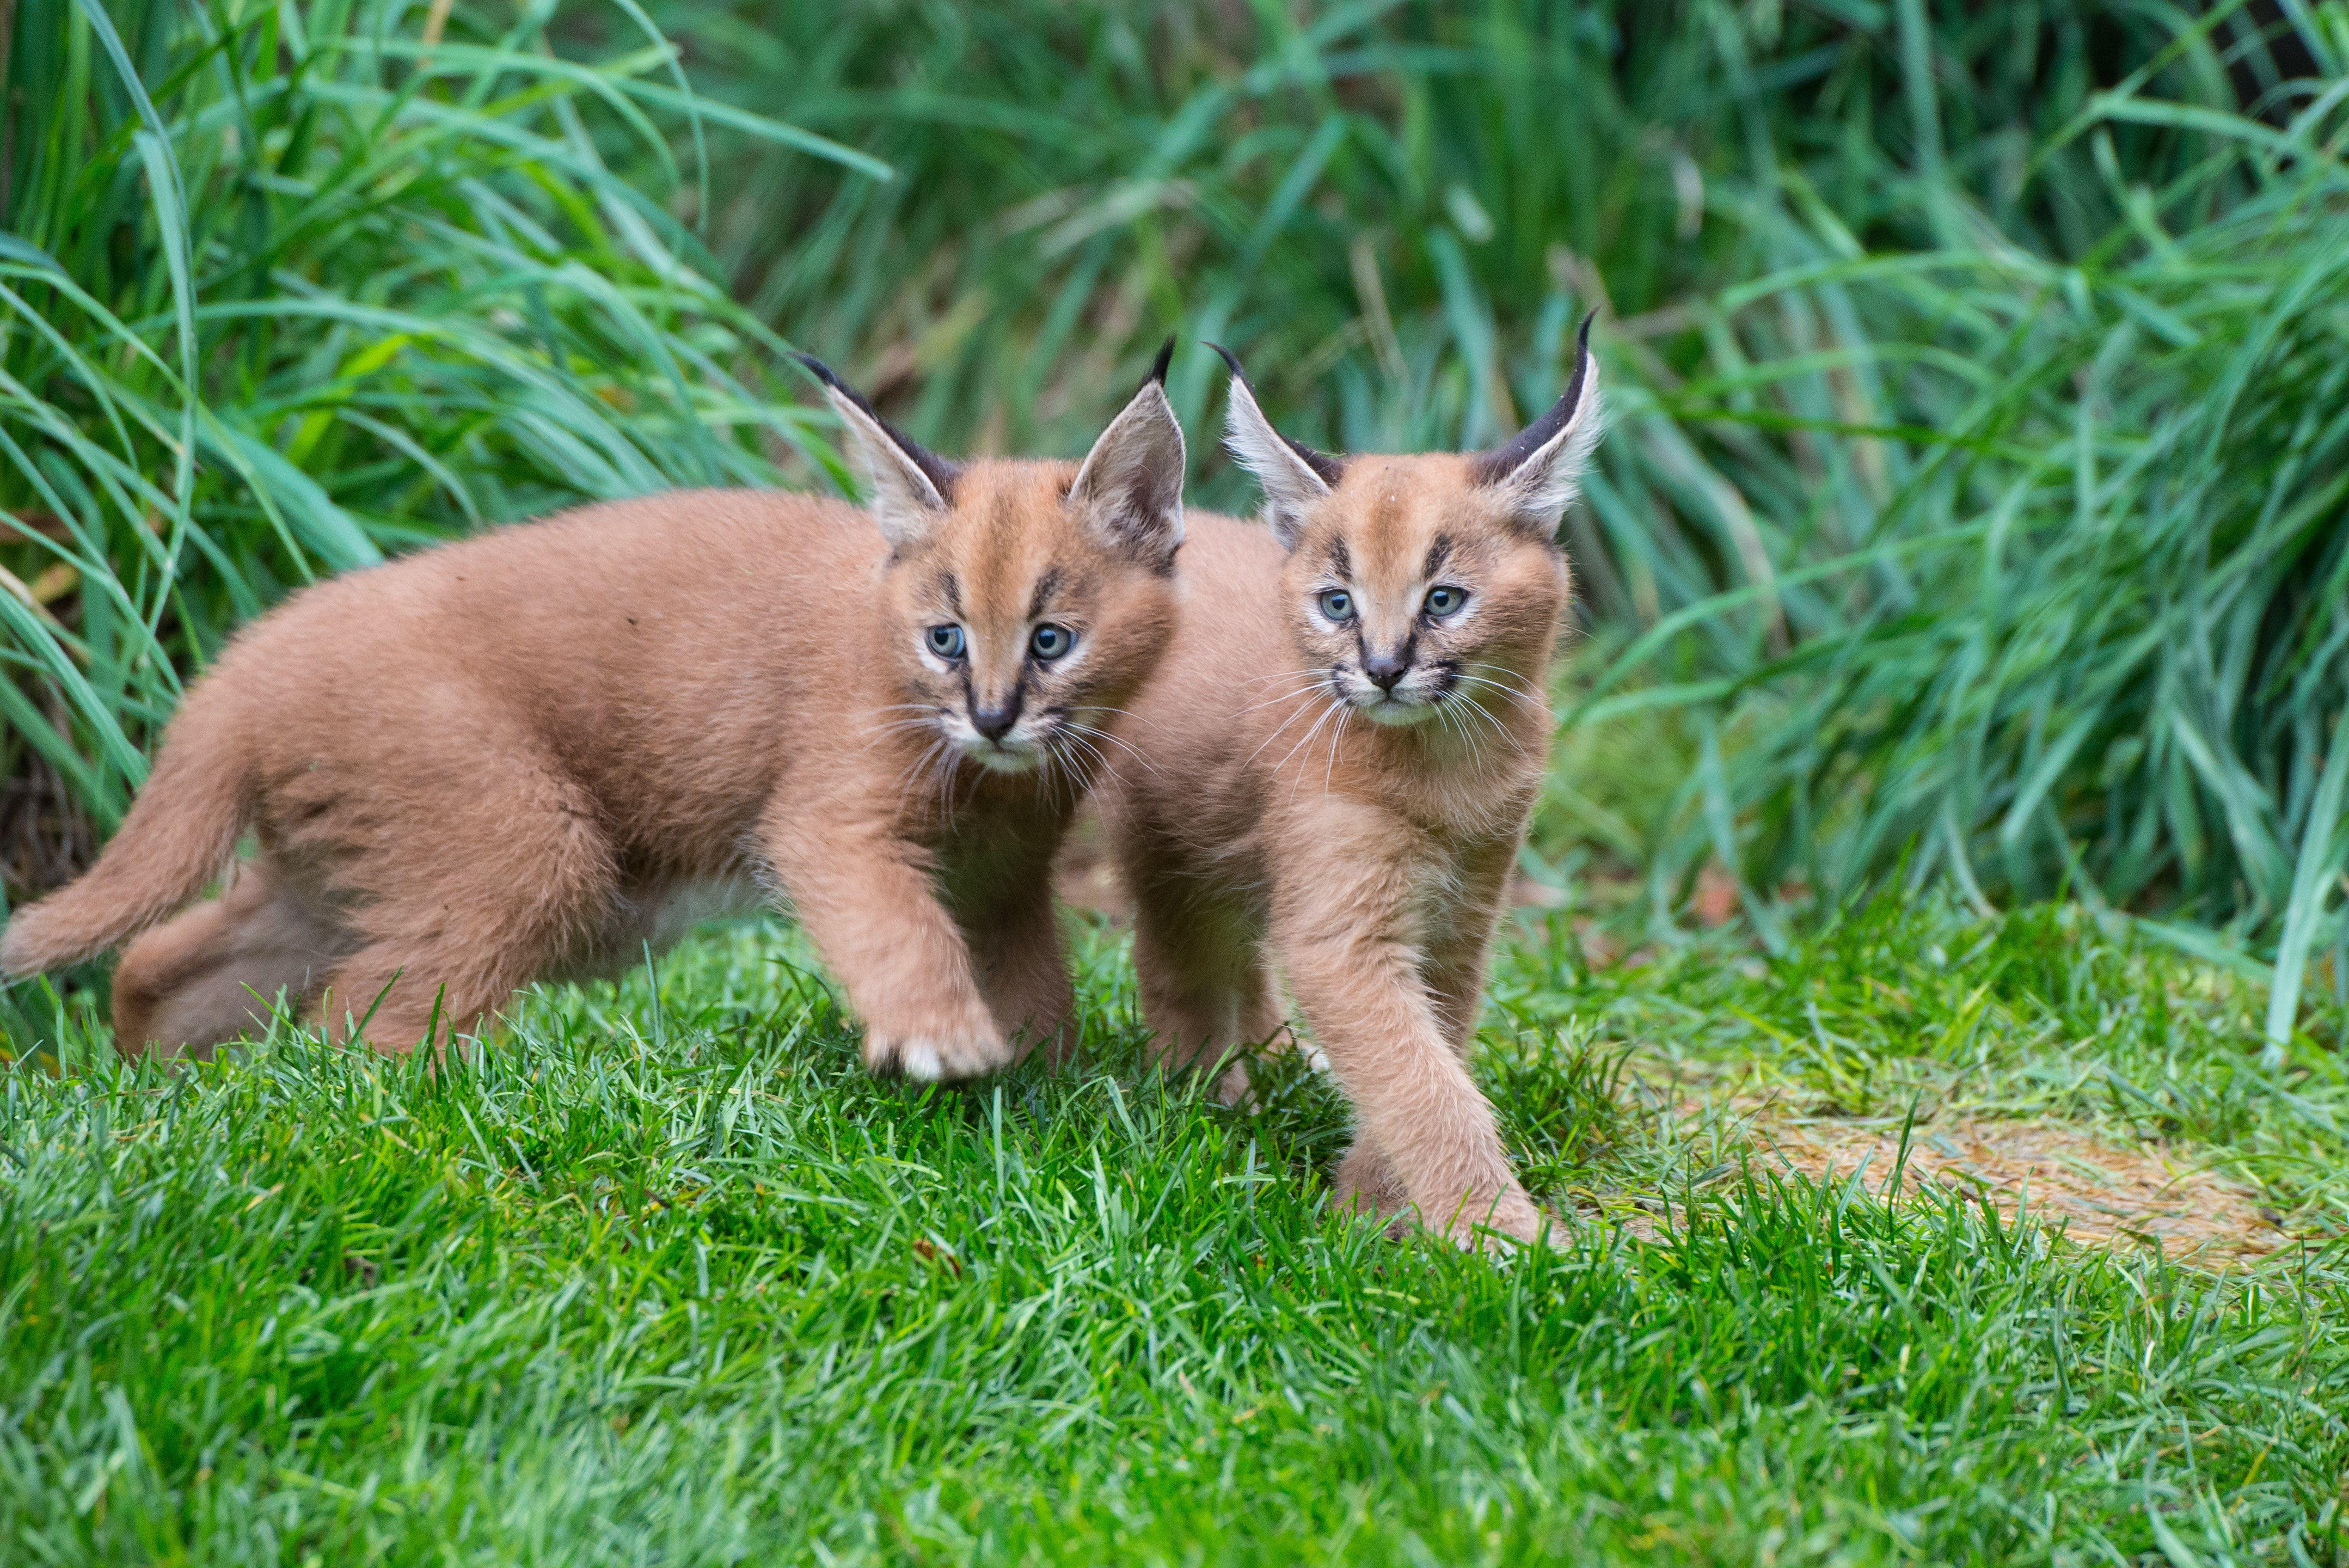 Zoo Born Caracal kittens, Caracal cat, Caracal